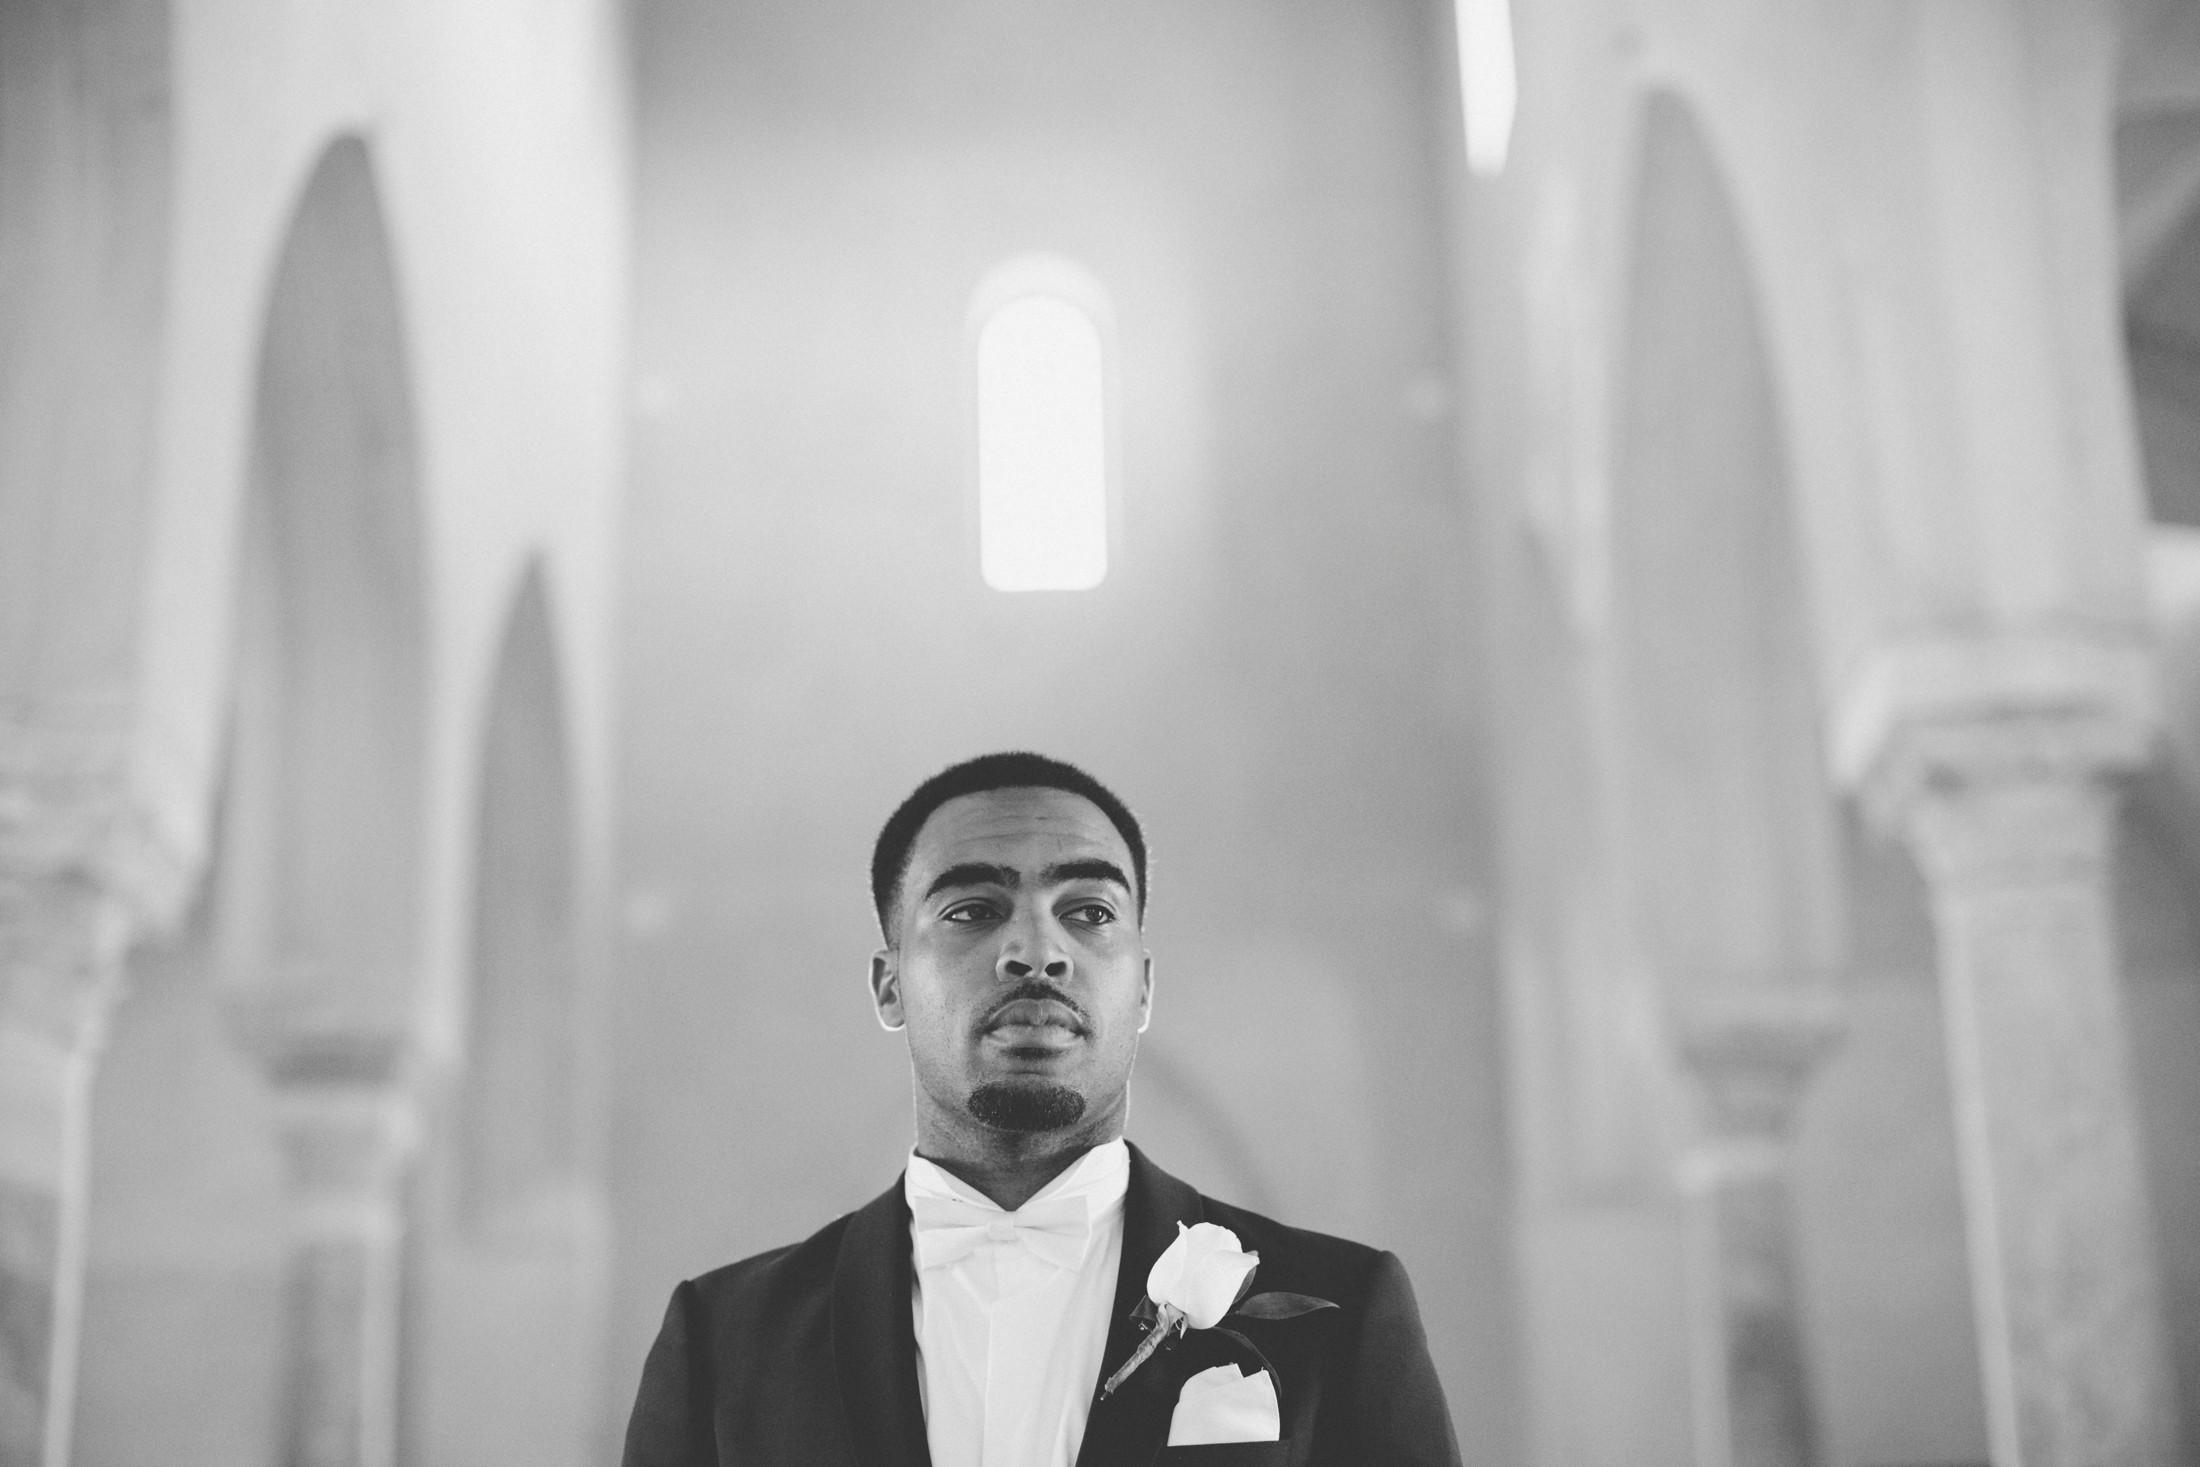 wedding in italy groom's portrait inside the church